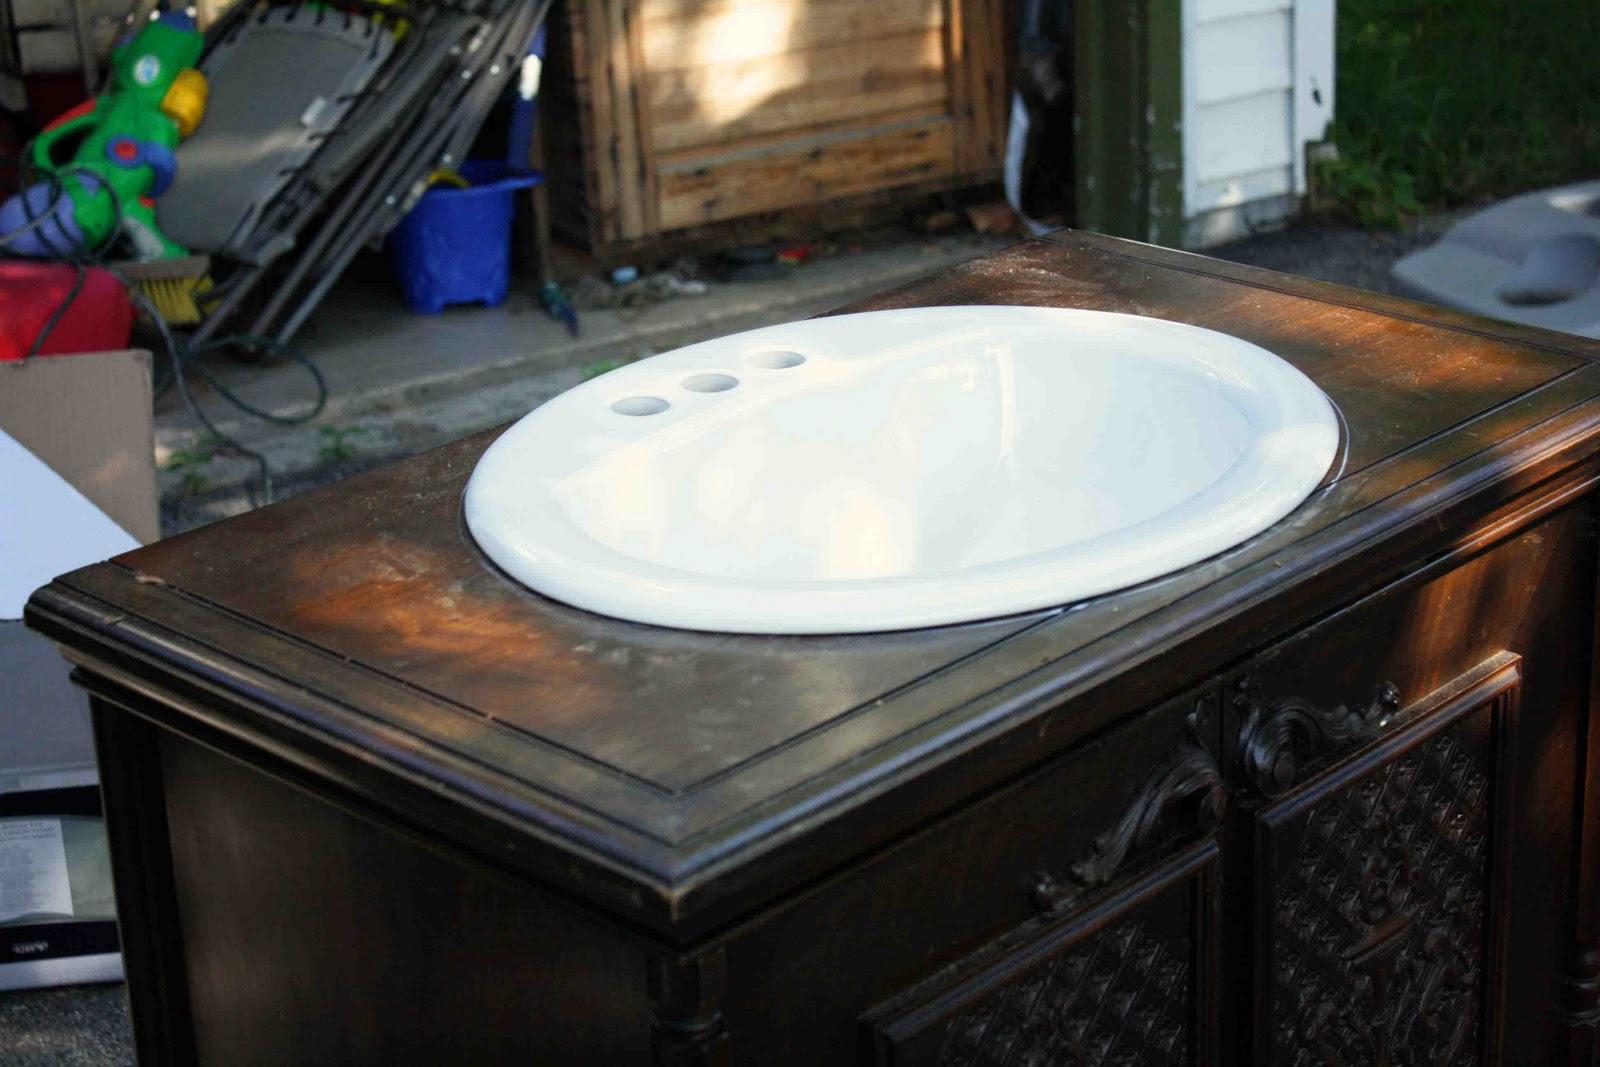 DIY Dresser into Bathroom Vanity Cabinet